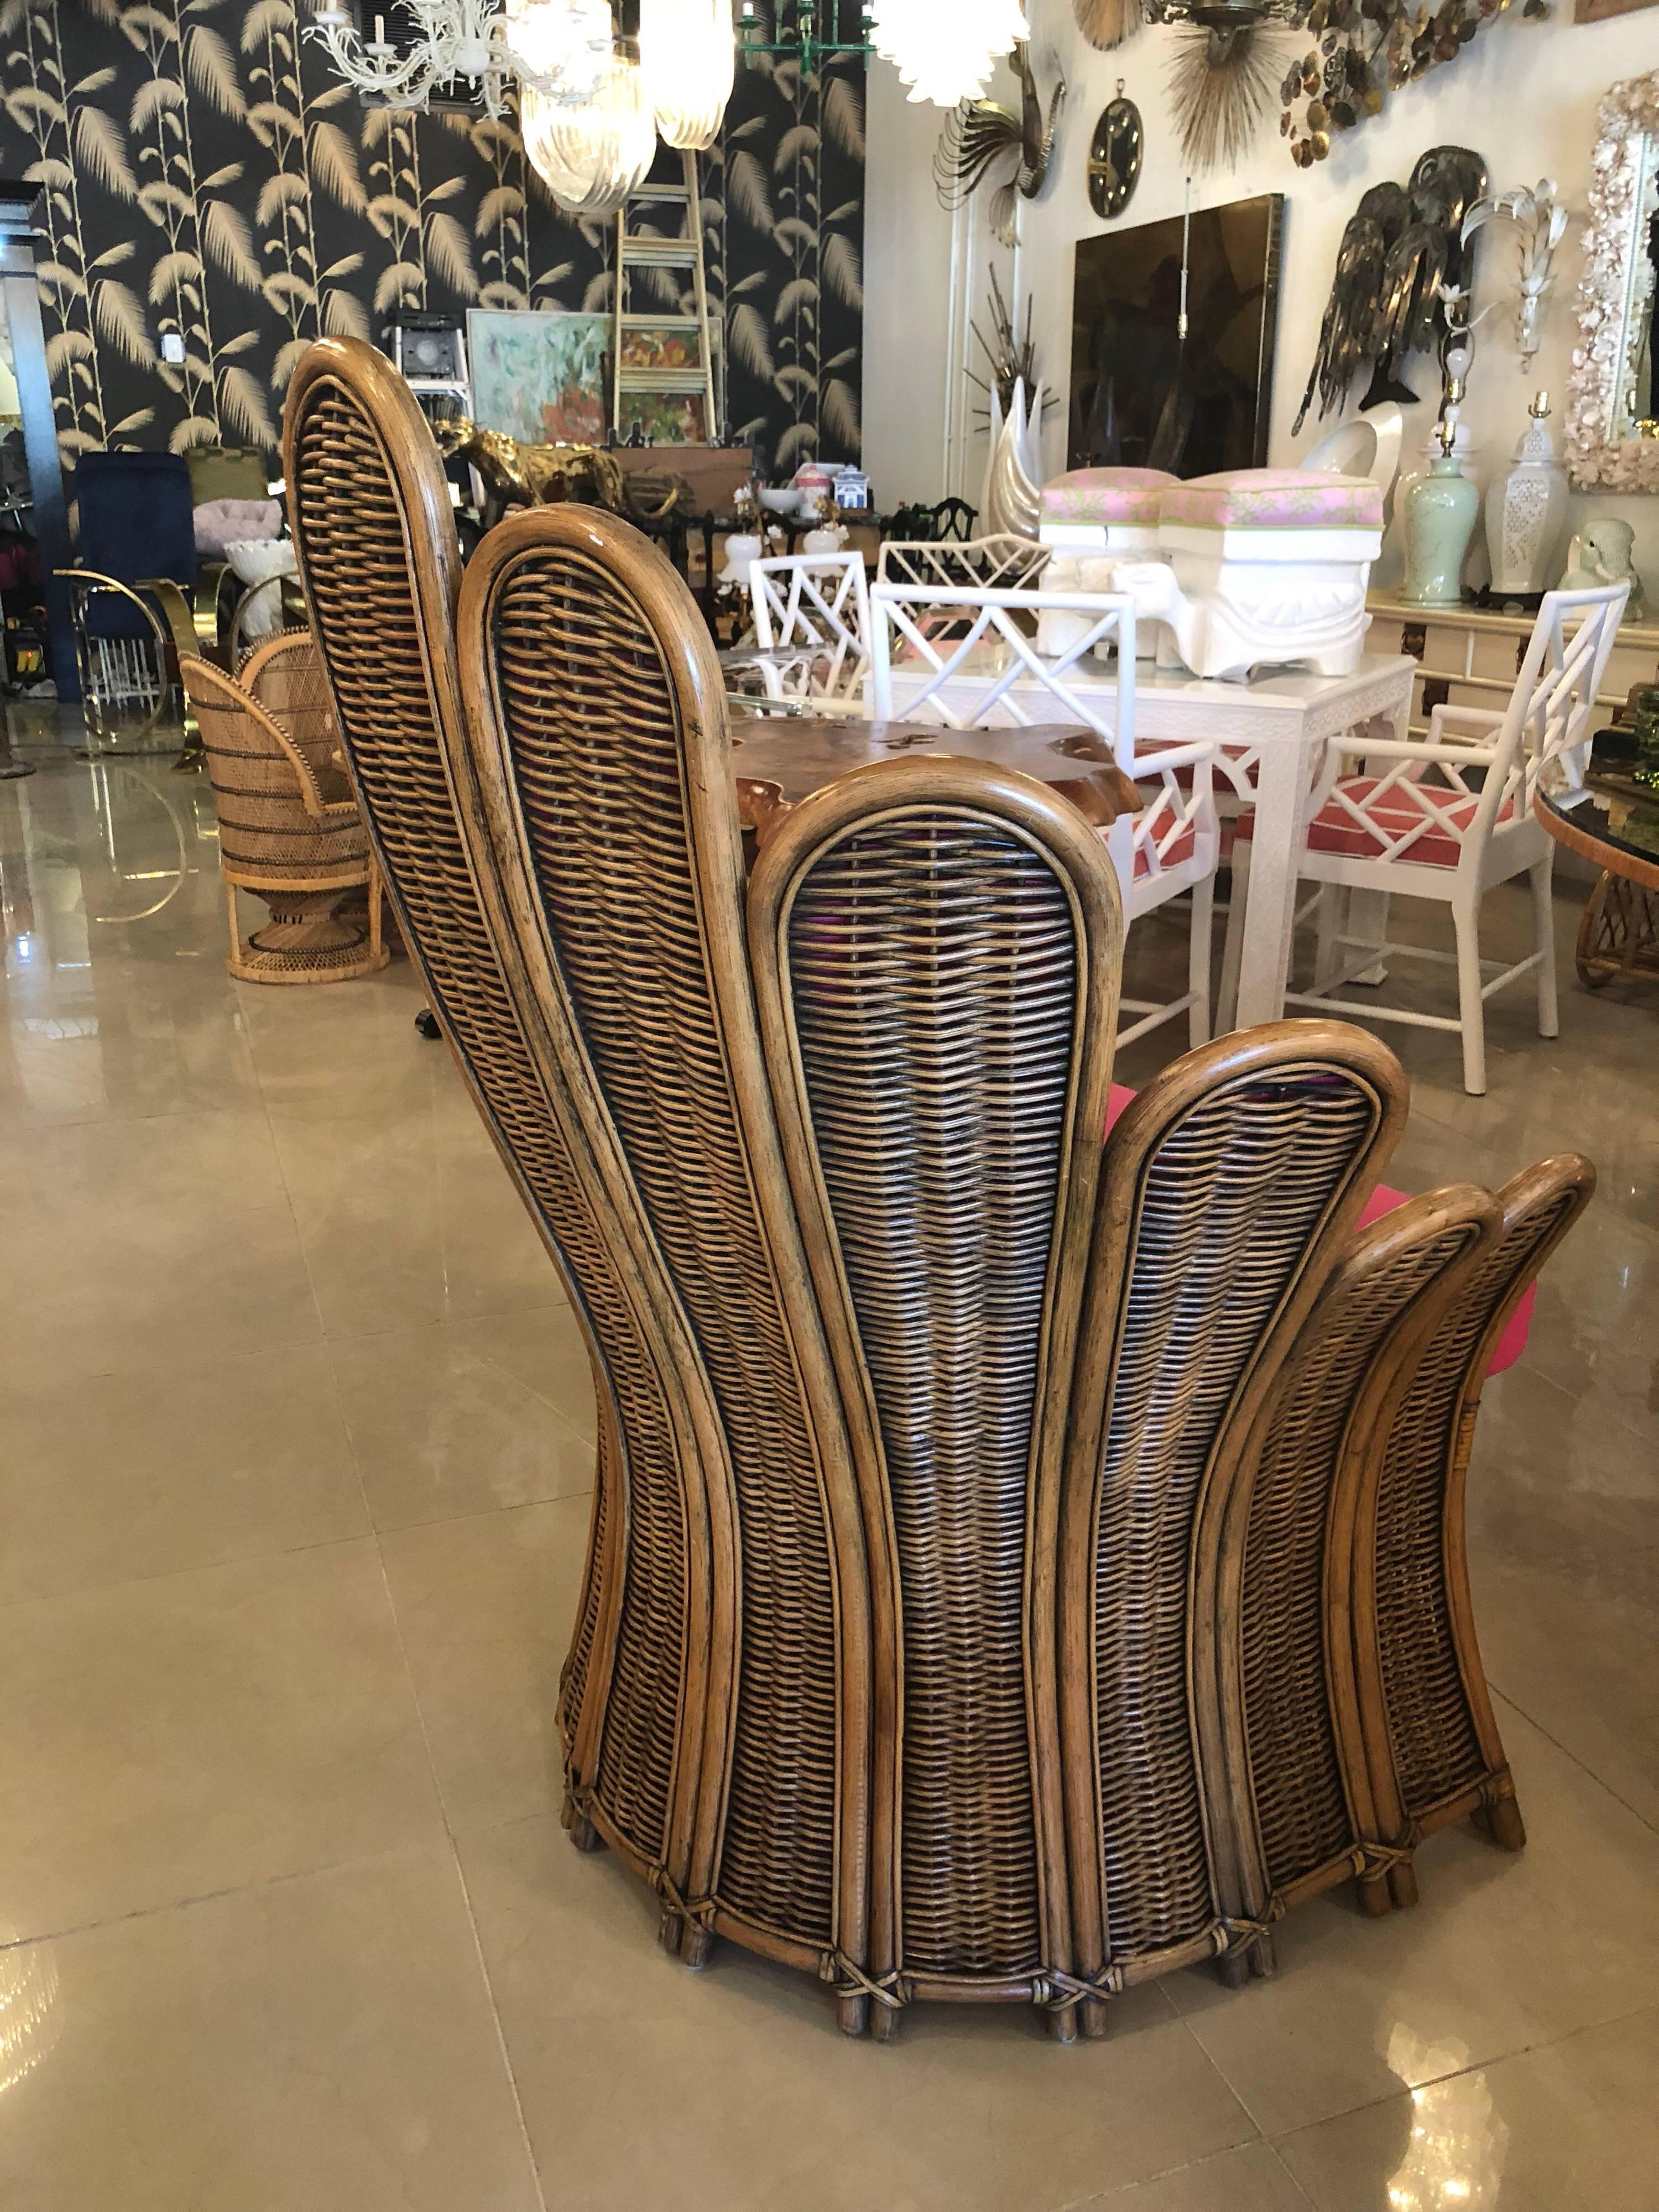 American Vintage Rattan Wicker Peacock Fan Back Arm Chair U0026 Ottoman  Footstool Upholstered For Sale